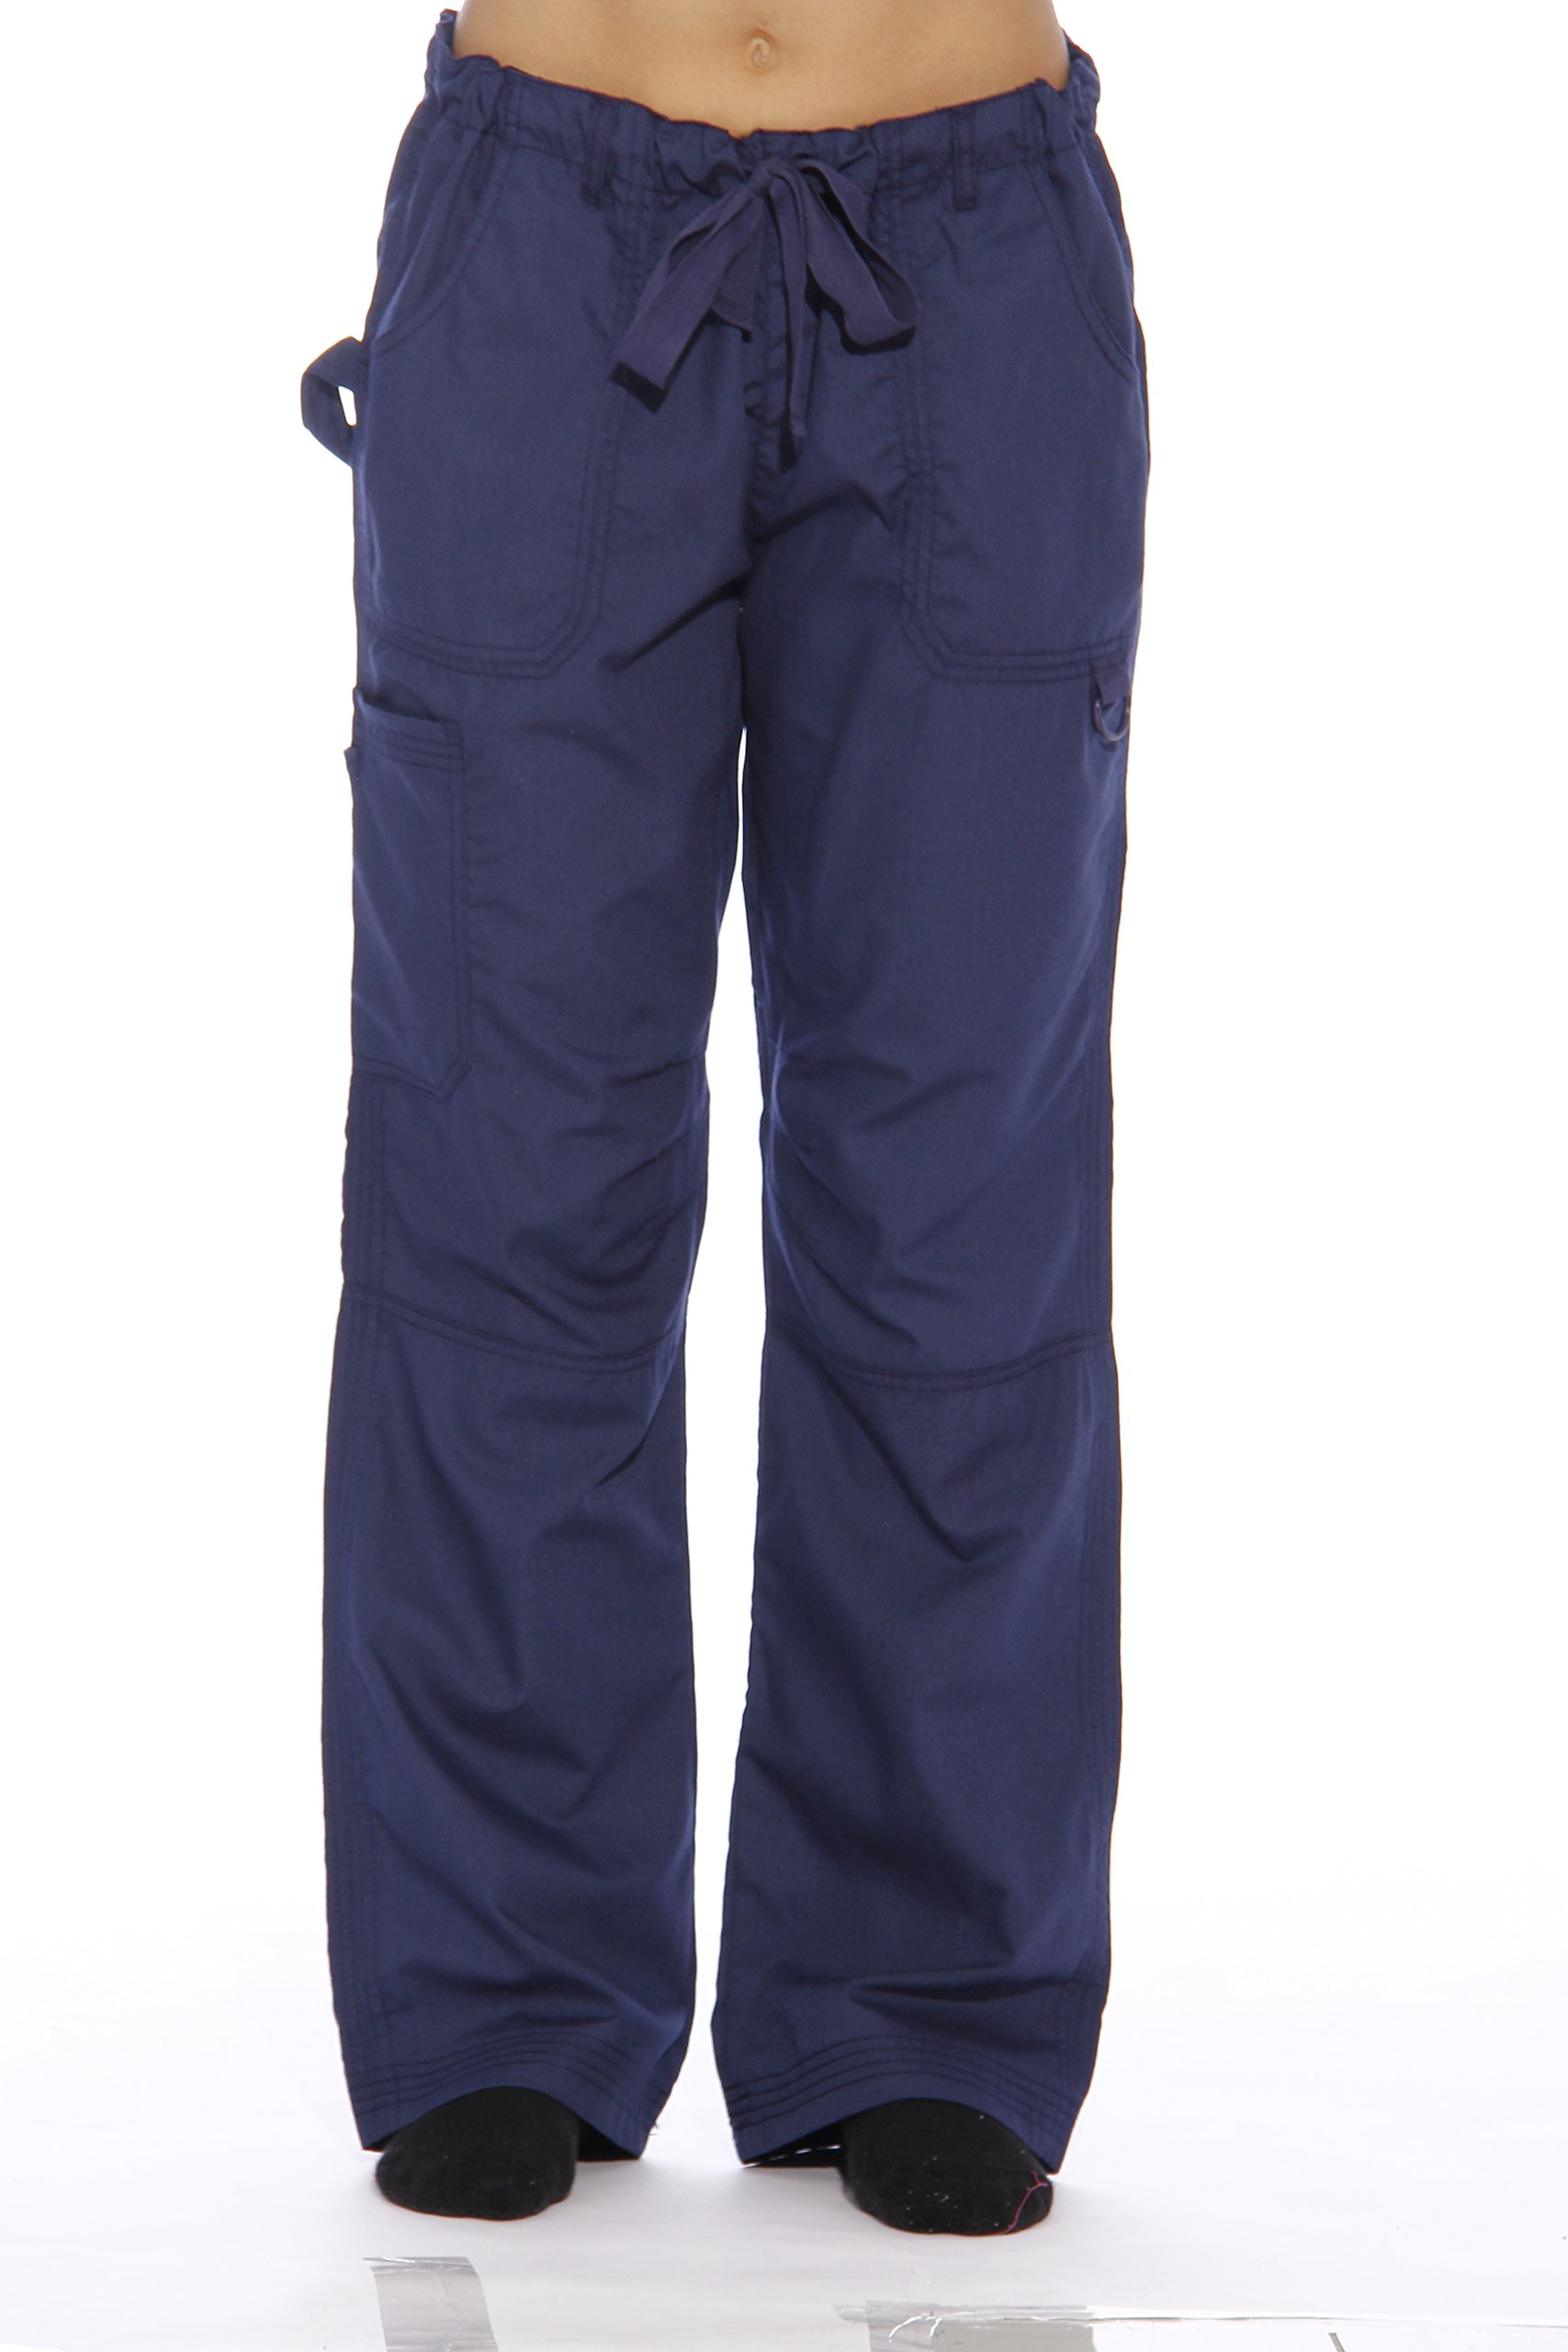 24000PNVY-S Just Love Women's Utility Scrub Pants / Scrubs, Navy Utility Pant, Small